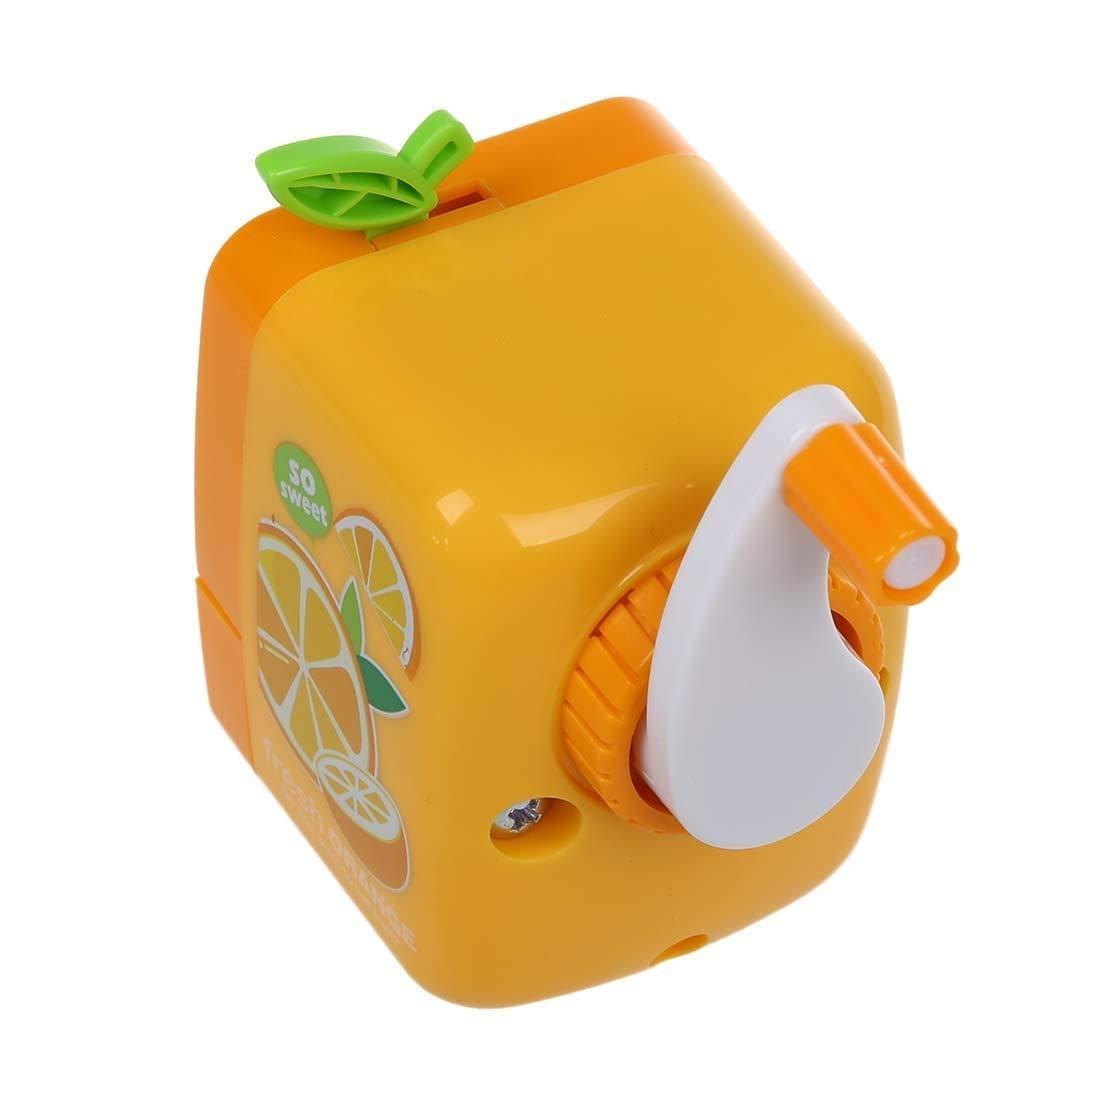 Cestval Orange Pattern Pencil Sharpener Plastic Manual Sharpener Novelty Kids Stationery School Office Supplies